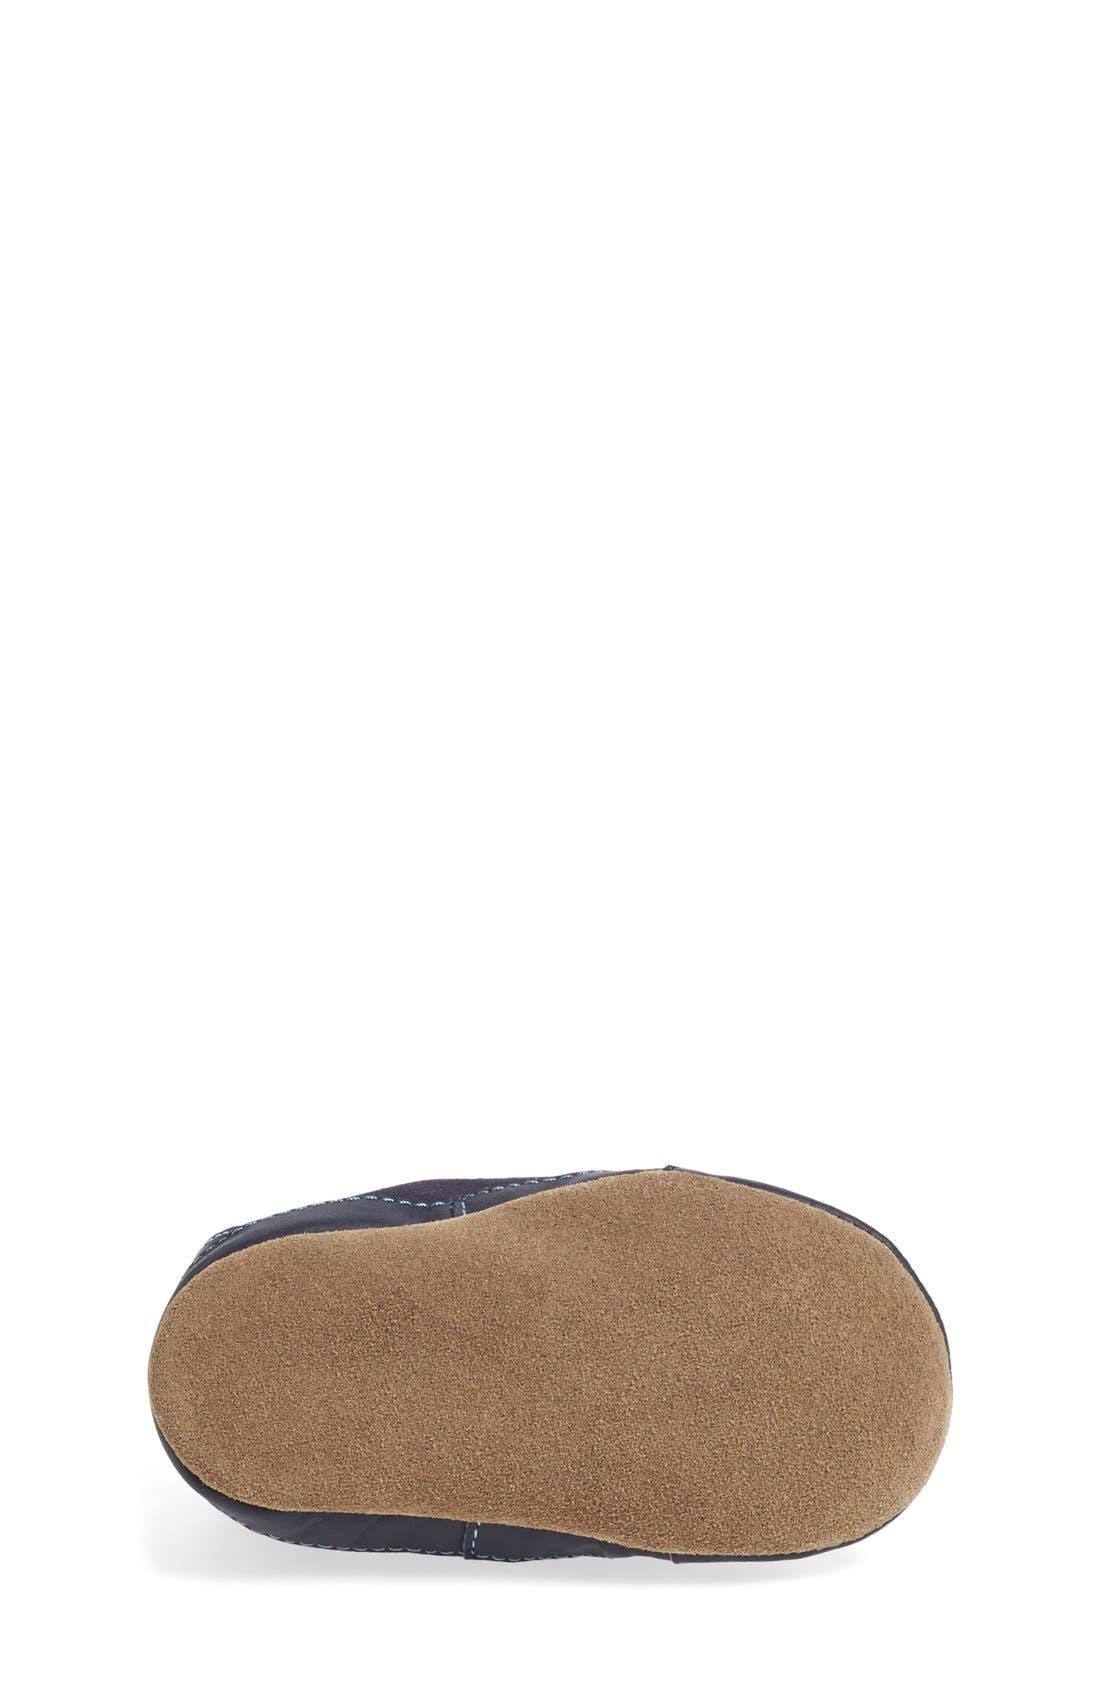 'Stylish Steve' Crib Shoe,                             Alternate thumbnail 4, color,                             NAVY